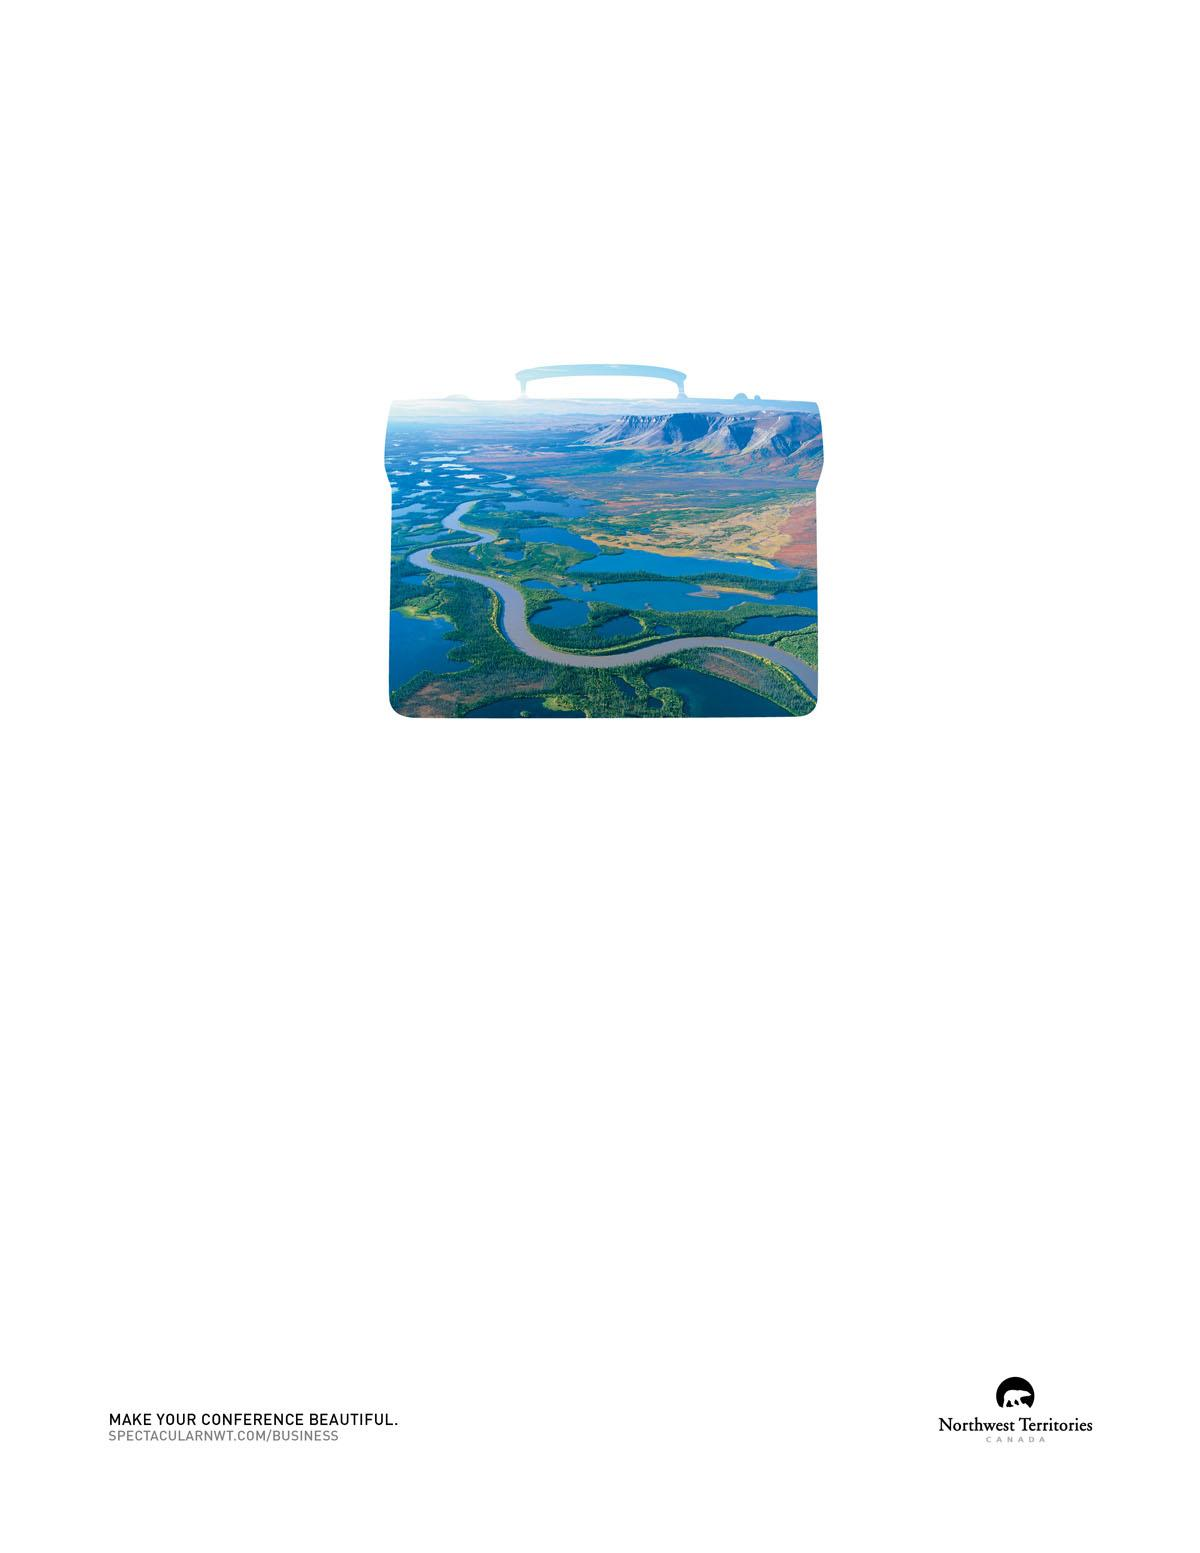 Northwest Territories Tourism Print Ad -  Briefcase